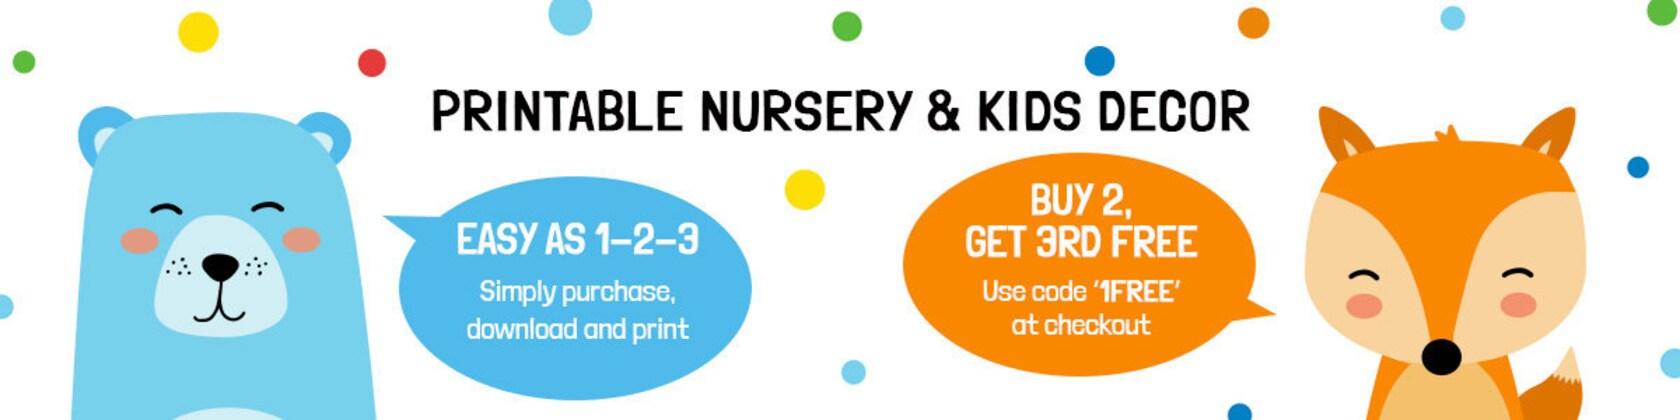 Printable Nursery & Kids Decor. Buy 2 Get 1 Free von BabyCoStore